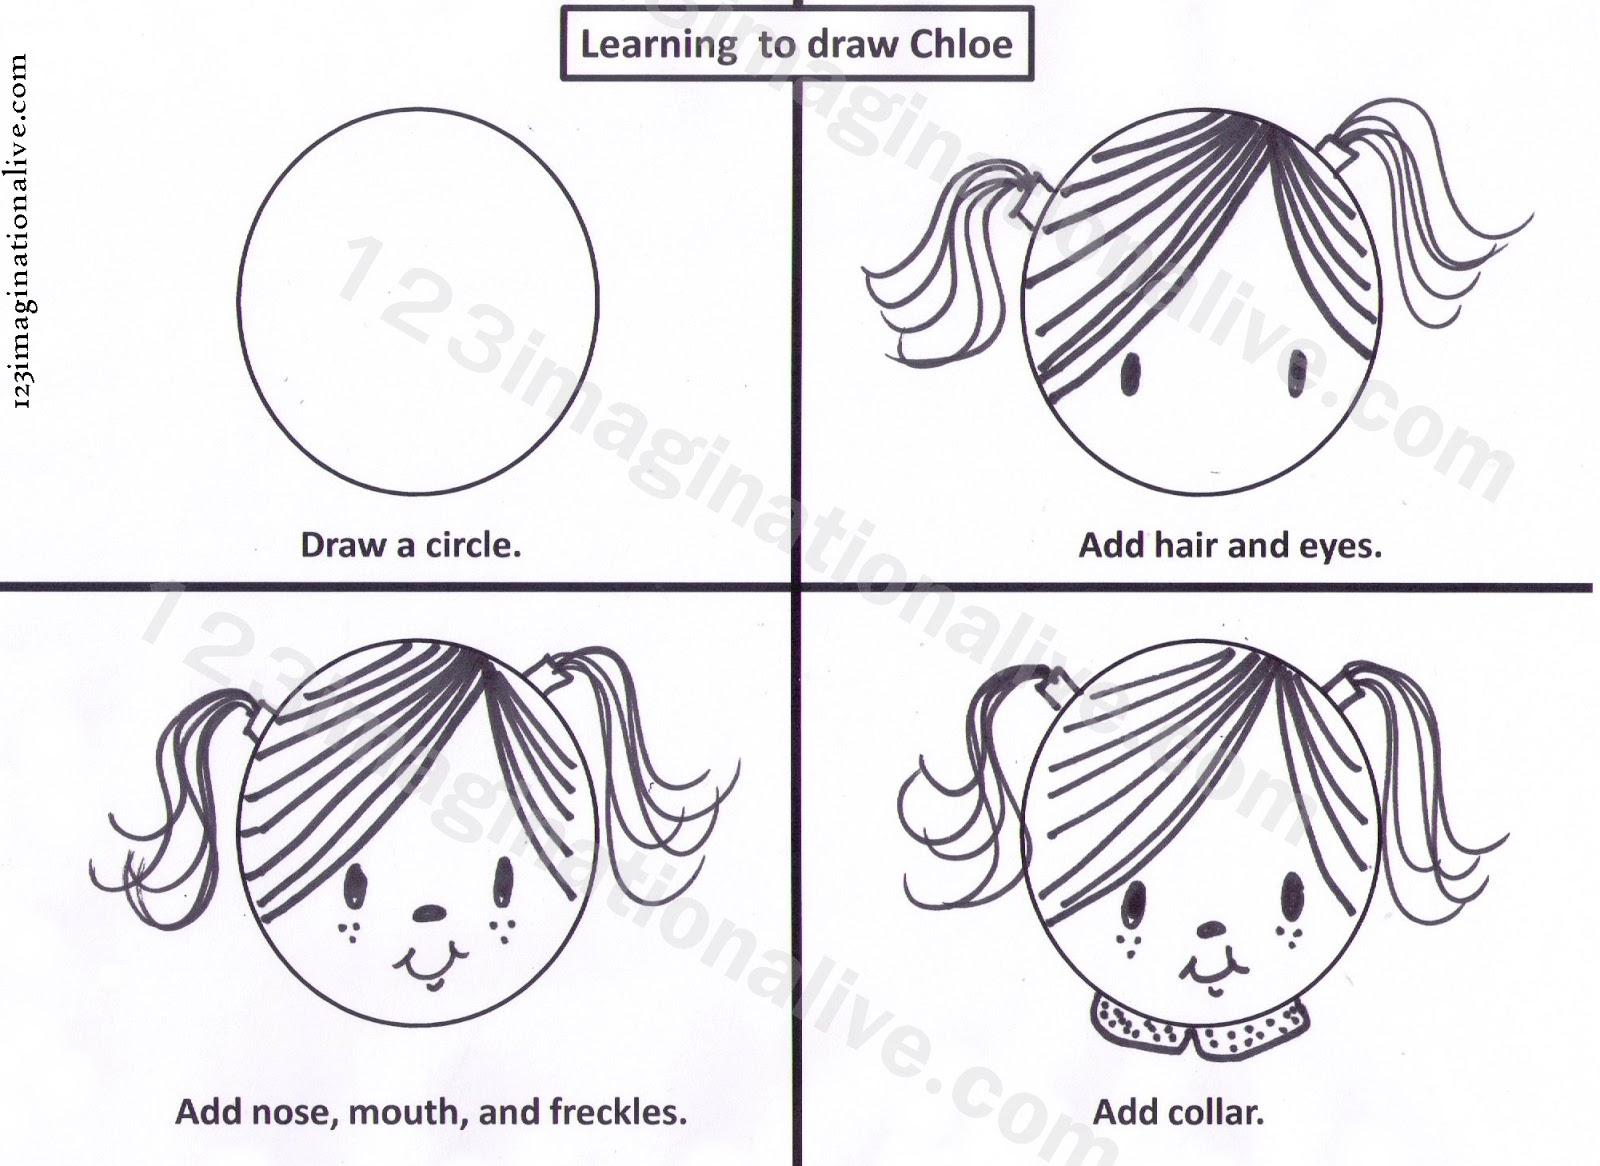 123imaginationalive Teaching Kids To Draw Chloe Art Lesson